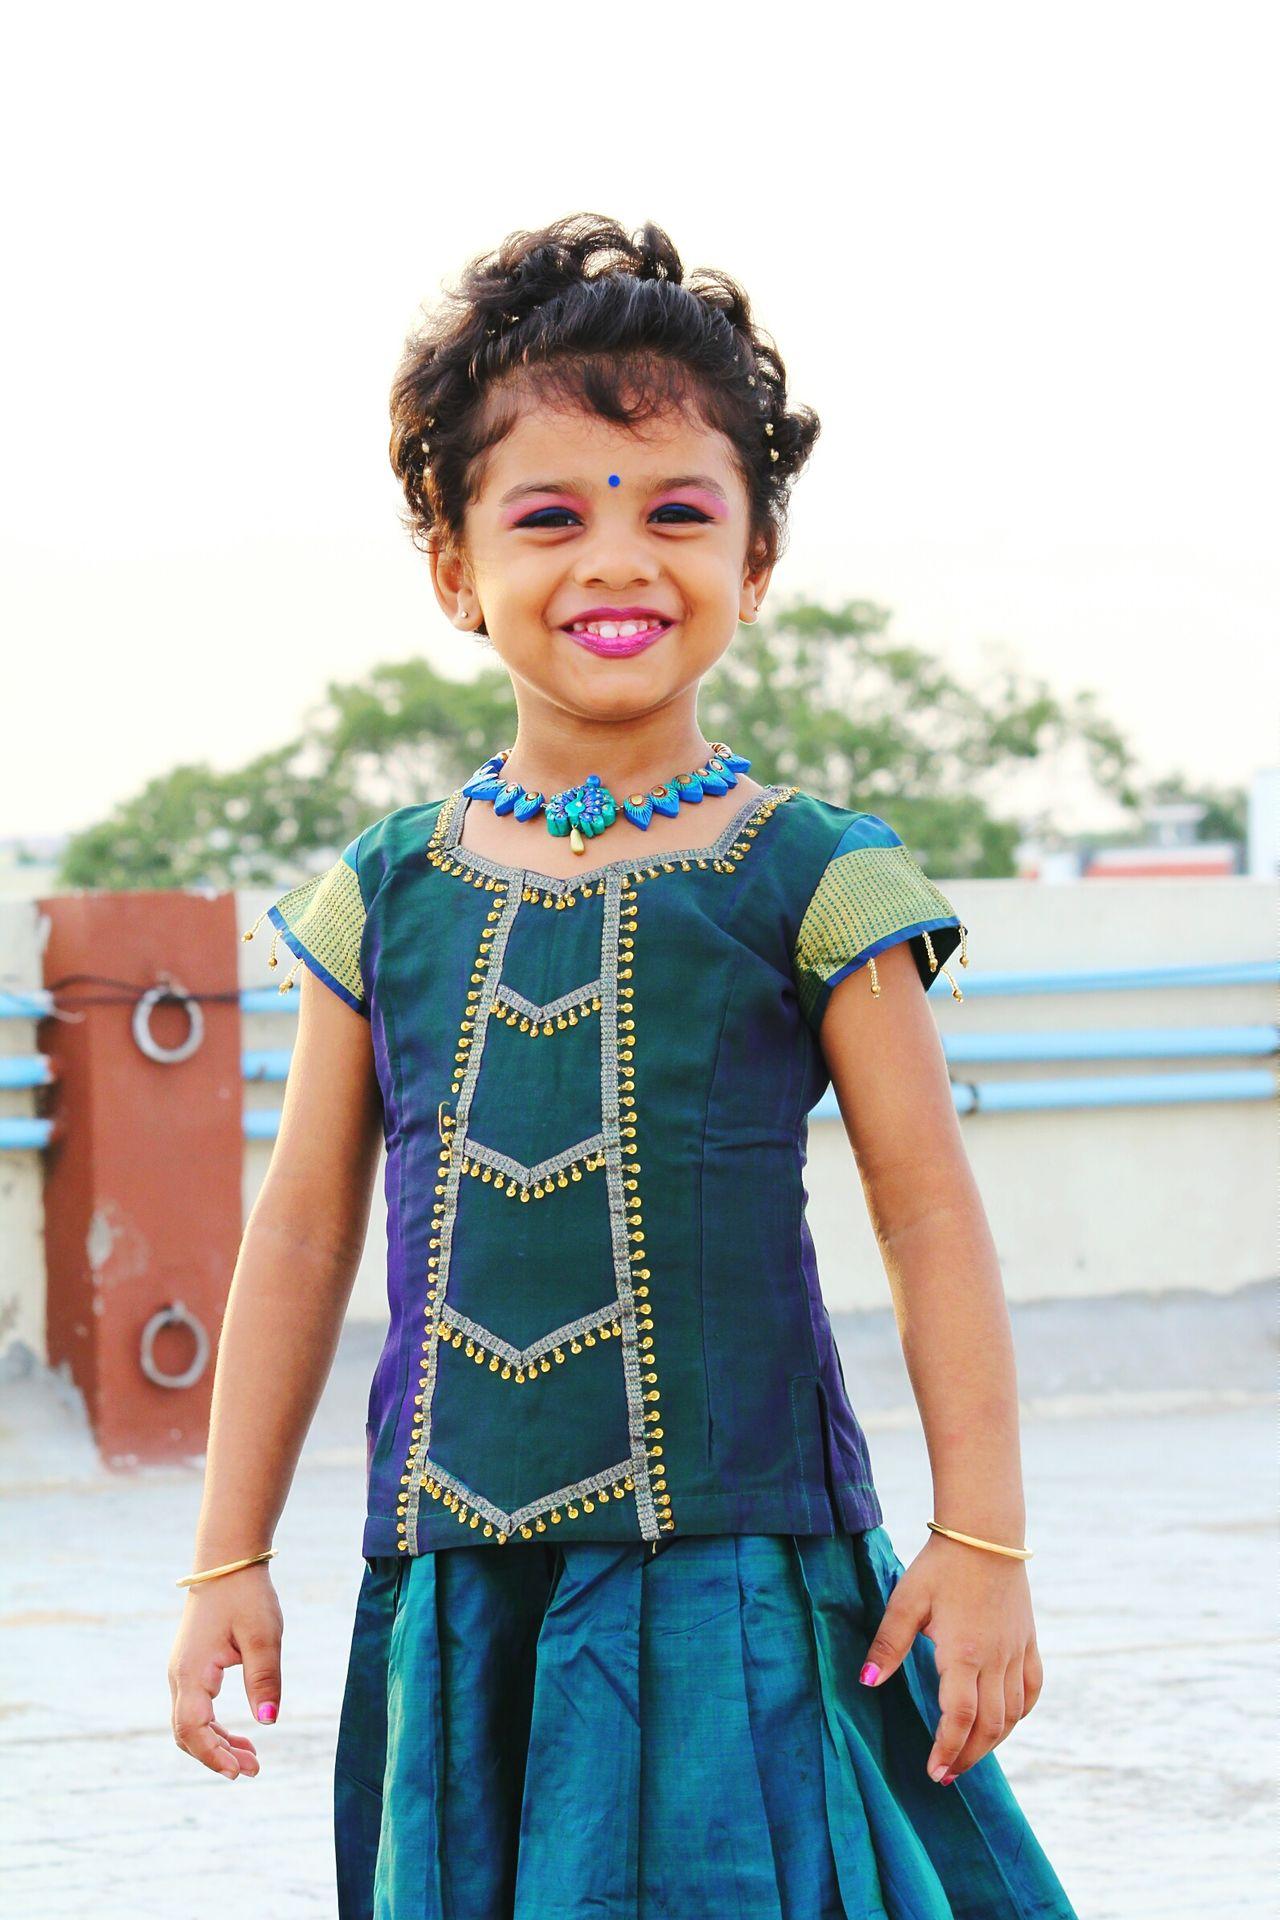 Kidsportrait Kidsphotography Mayuriterracotta Handmade Jewellery Indiankids Indiangirl Traditional Clothing Indiandress Ethnicwear Ethnic Terracotta Jewellery.. Terracotta Handmade By Me Handmadewithlove Childmodel